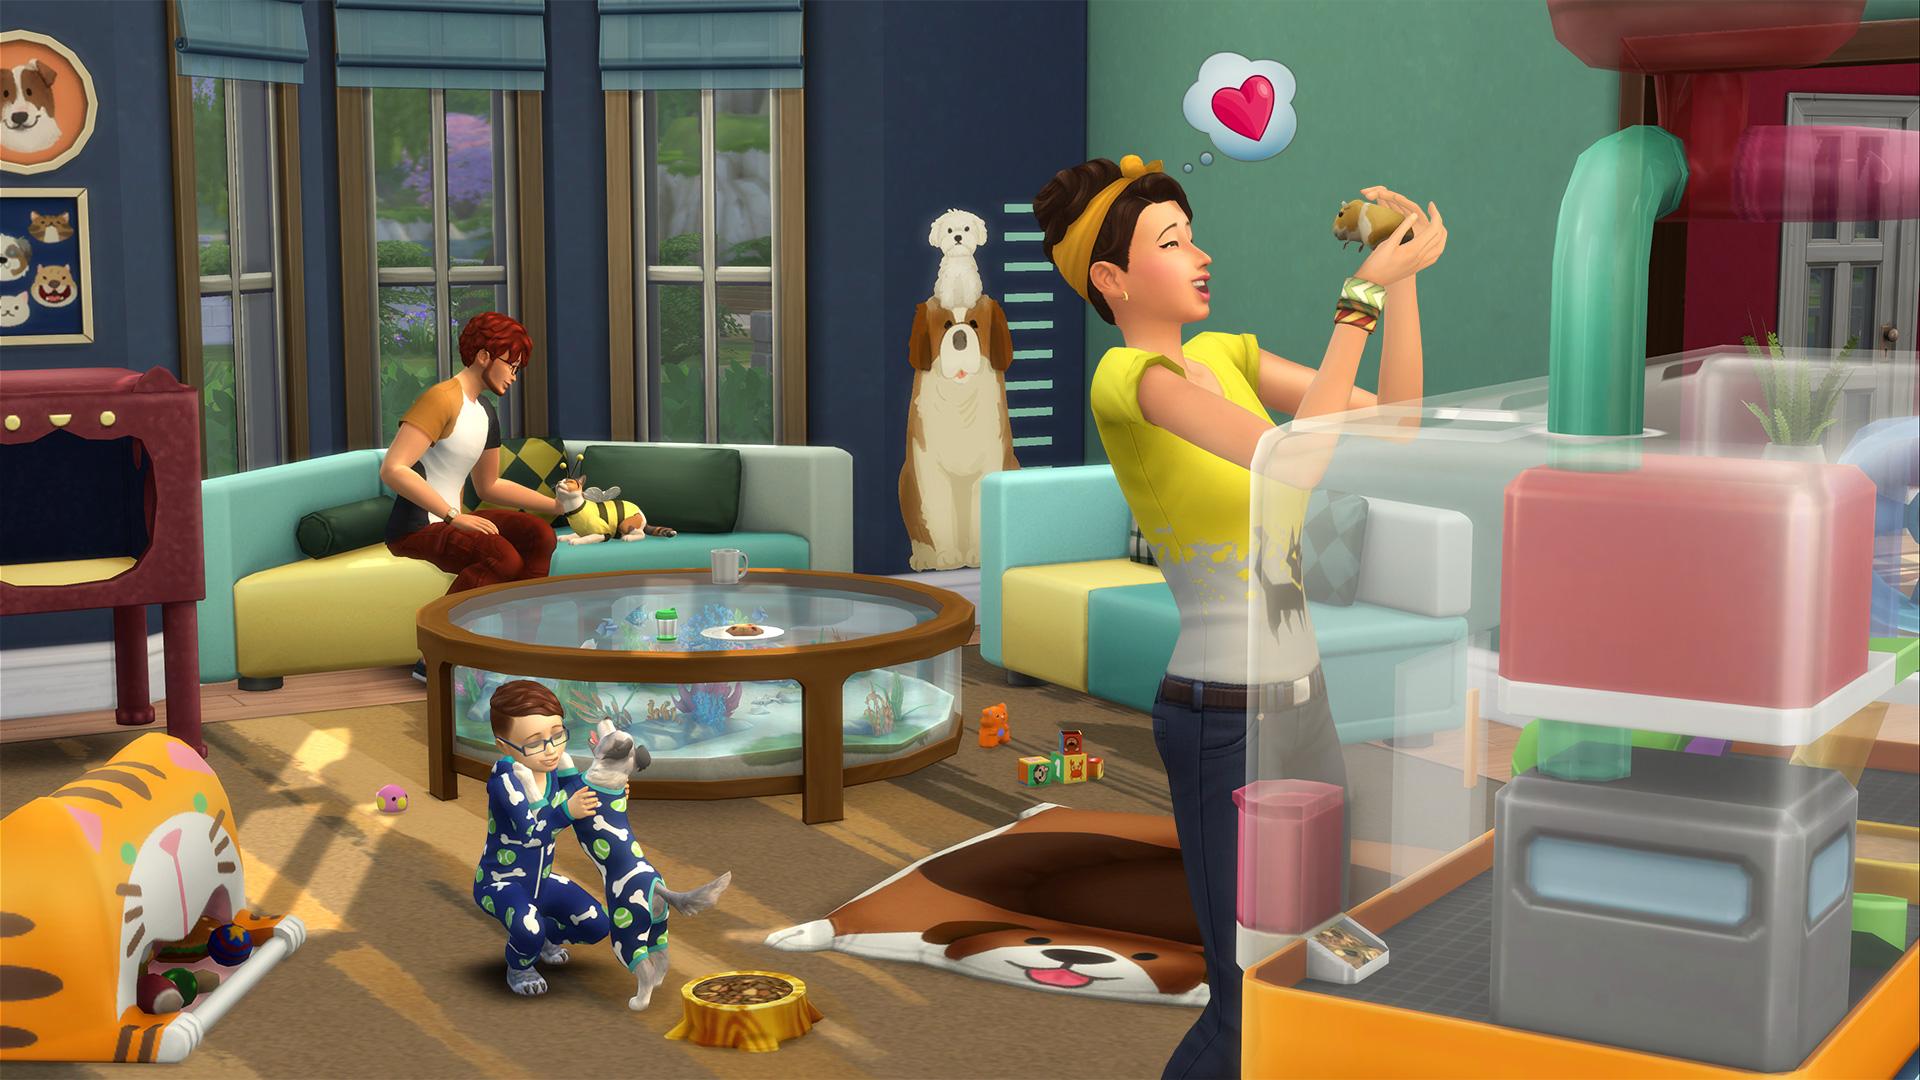 Die Sims 4 Mein Erstes Haustier Accessoires Simtimes